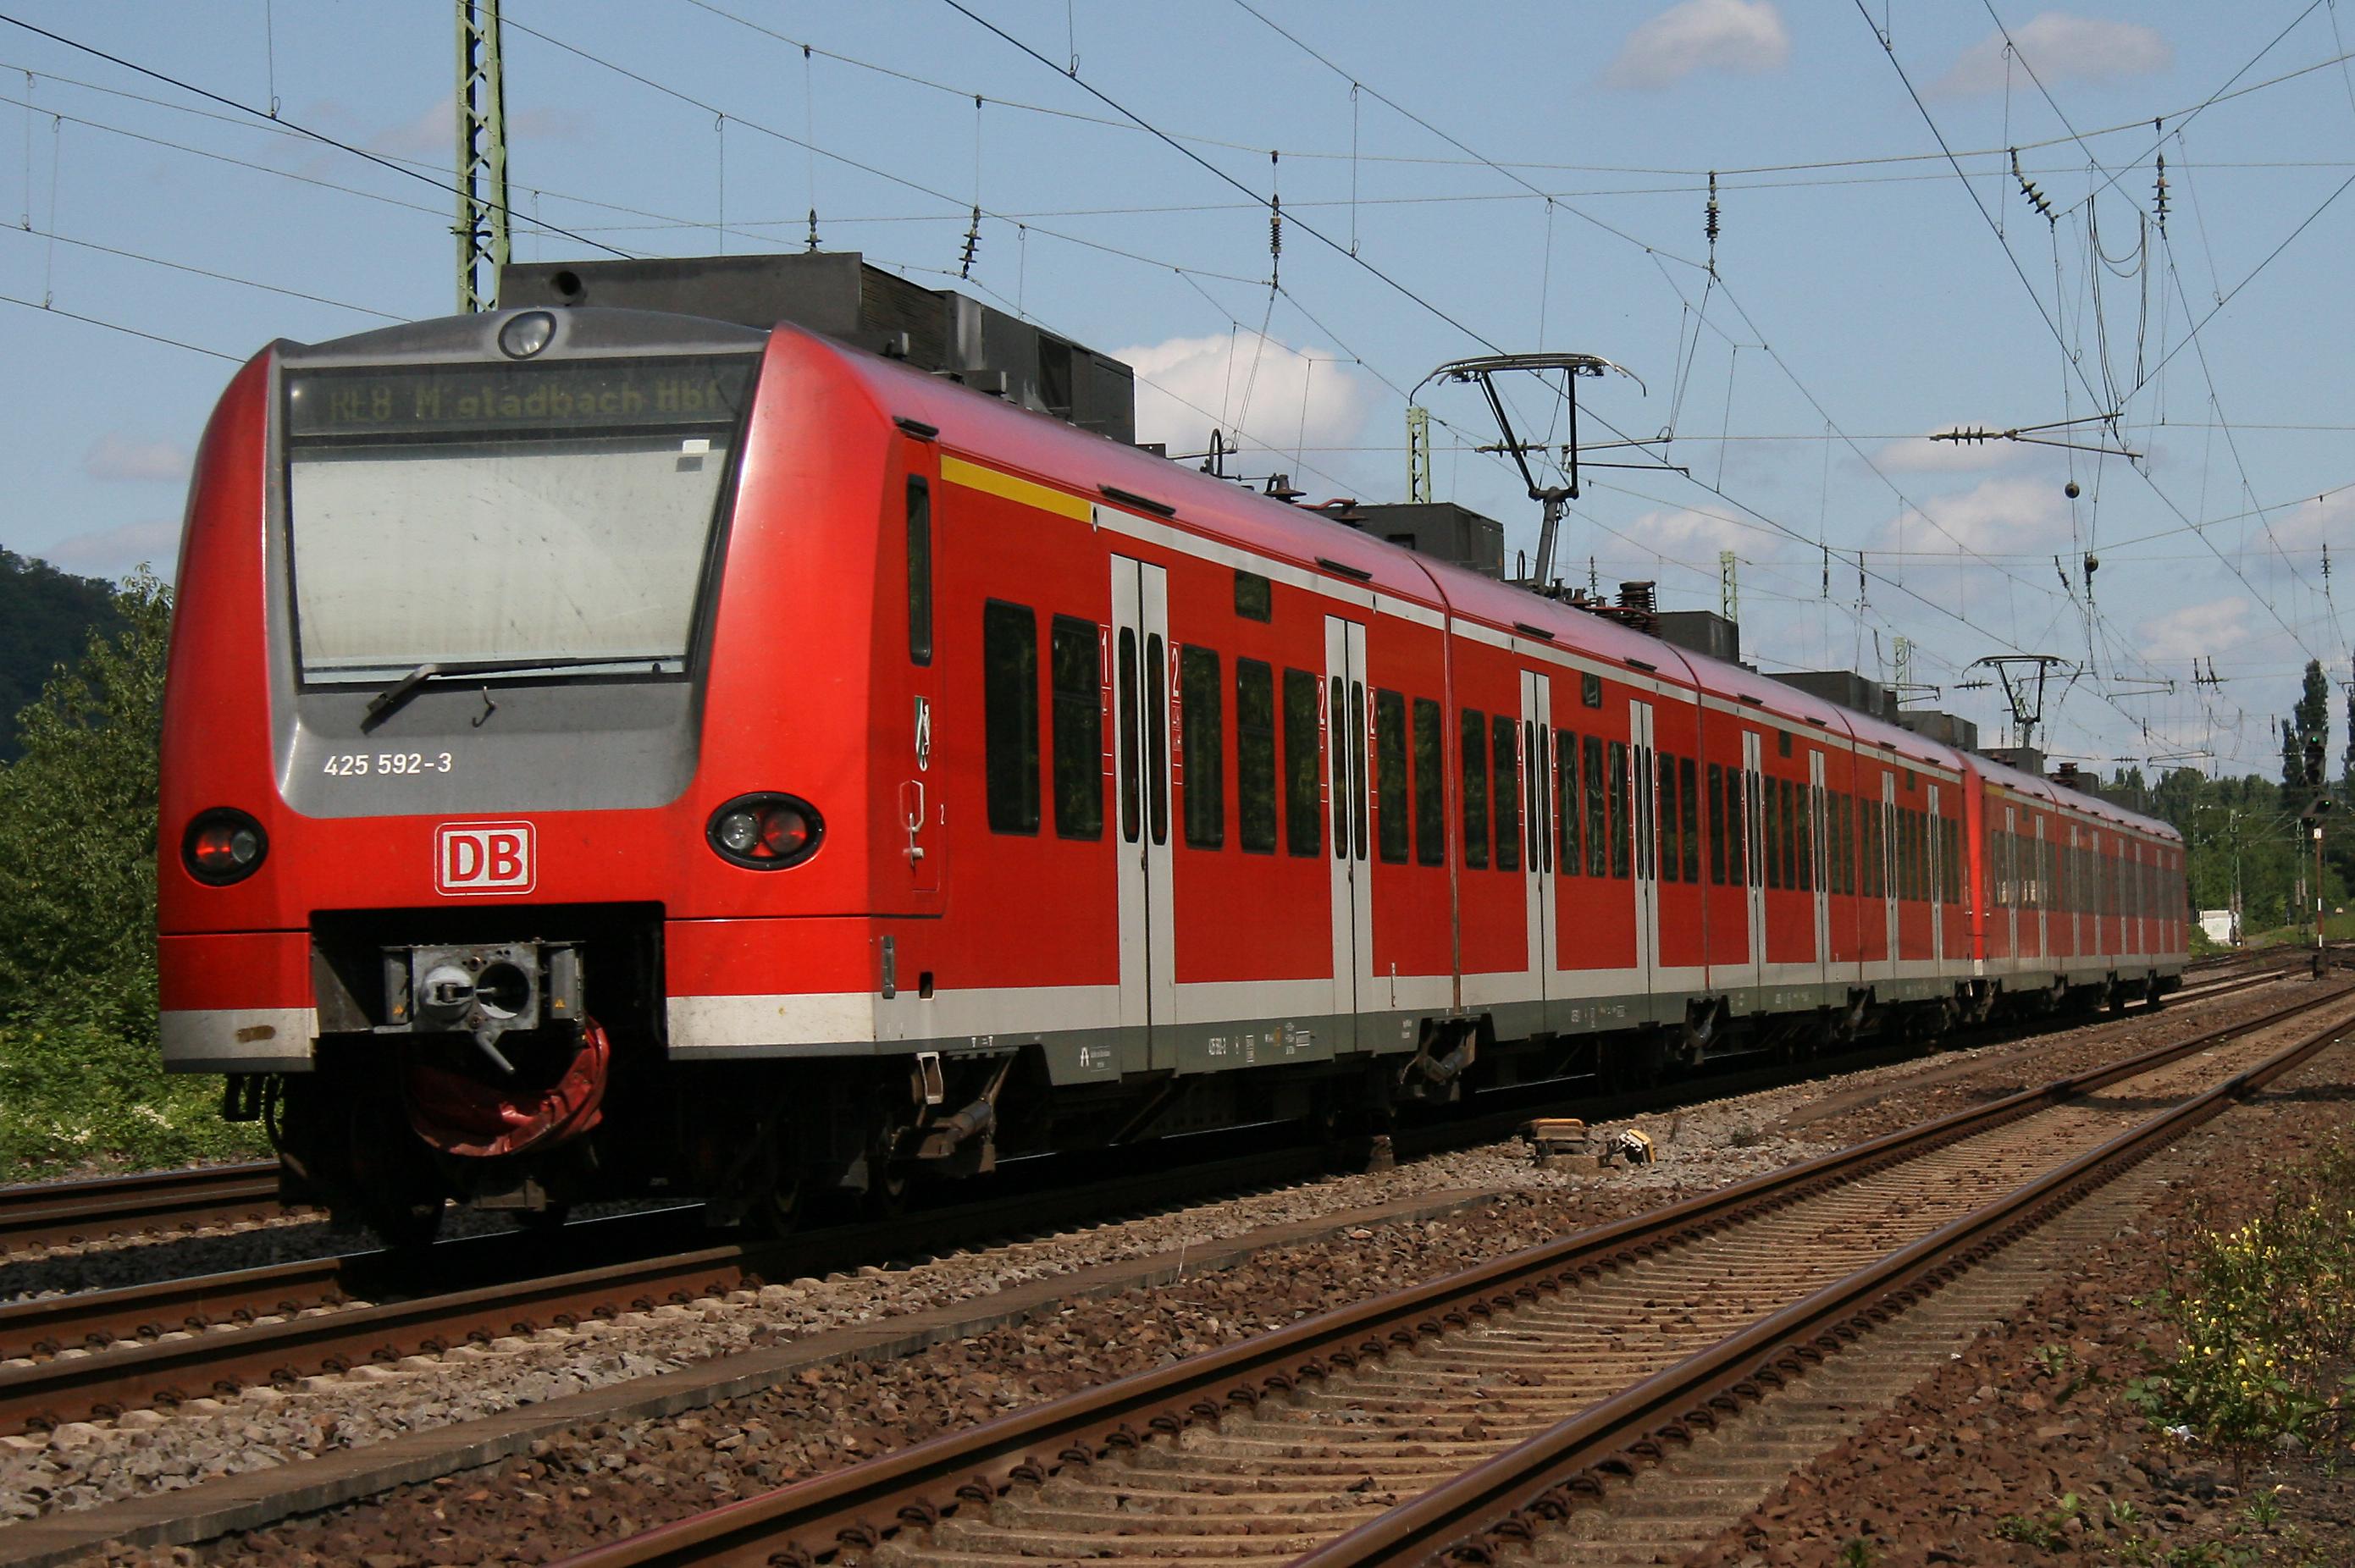 File:Baureihe 425 592-3.jpg